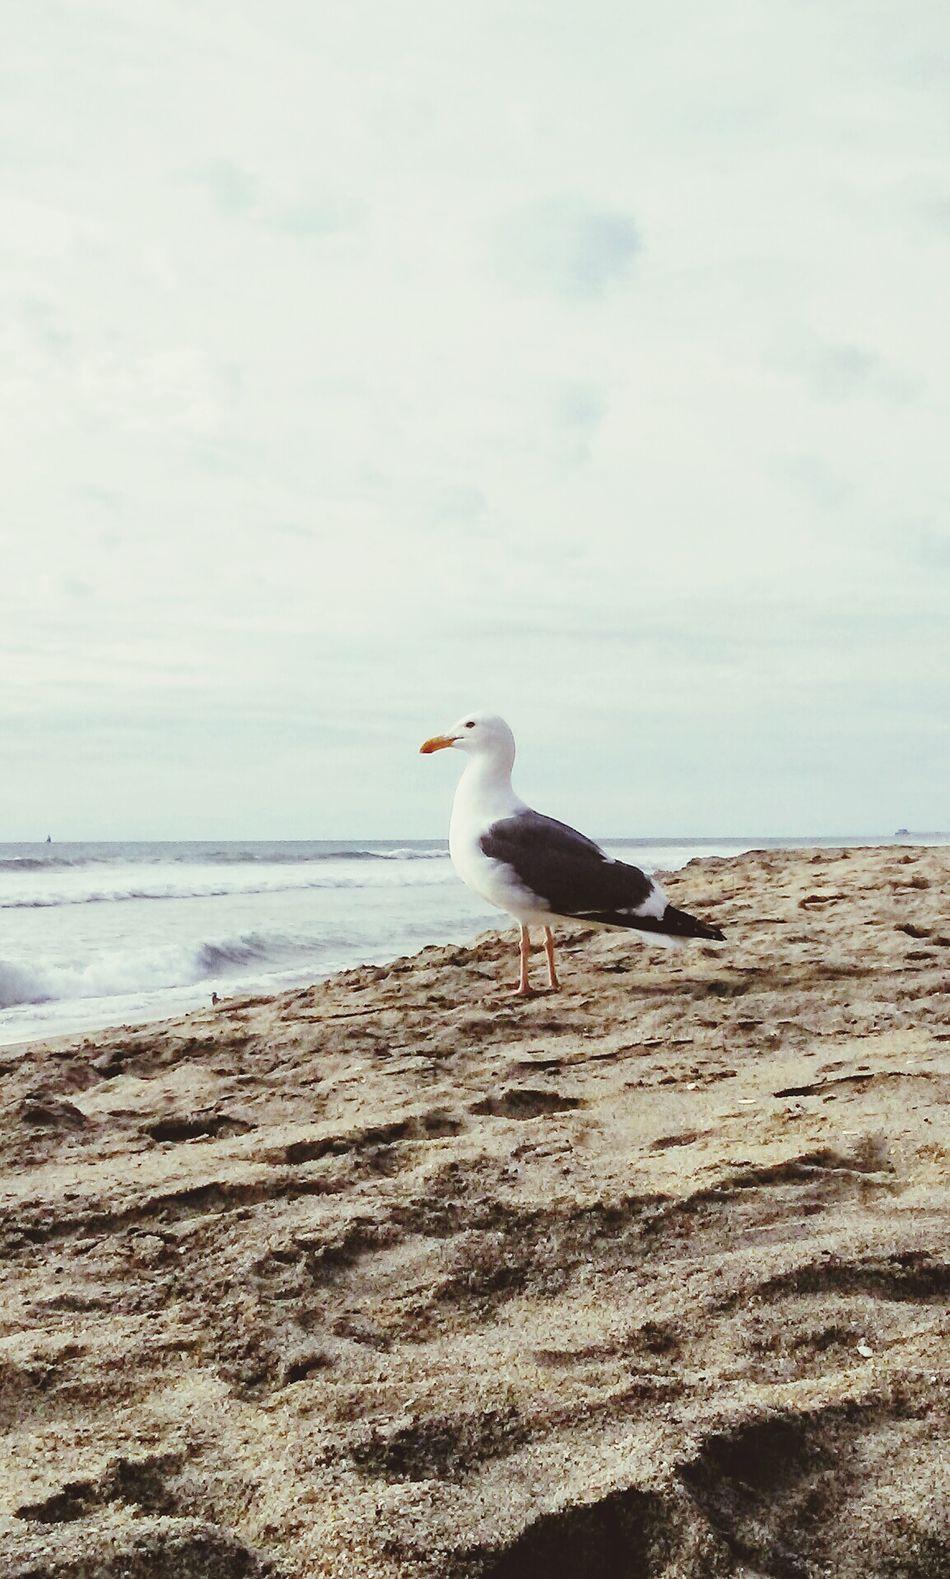 Taking Photos Enjoying Life Sky And Clouds Carlsbad Beach Sand Ocean Beach Photography Seagull Beach Chicken